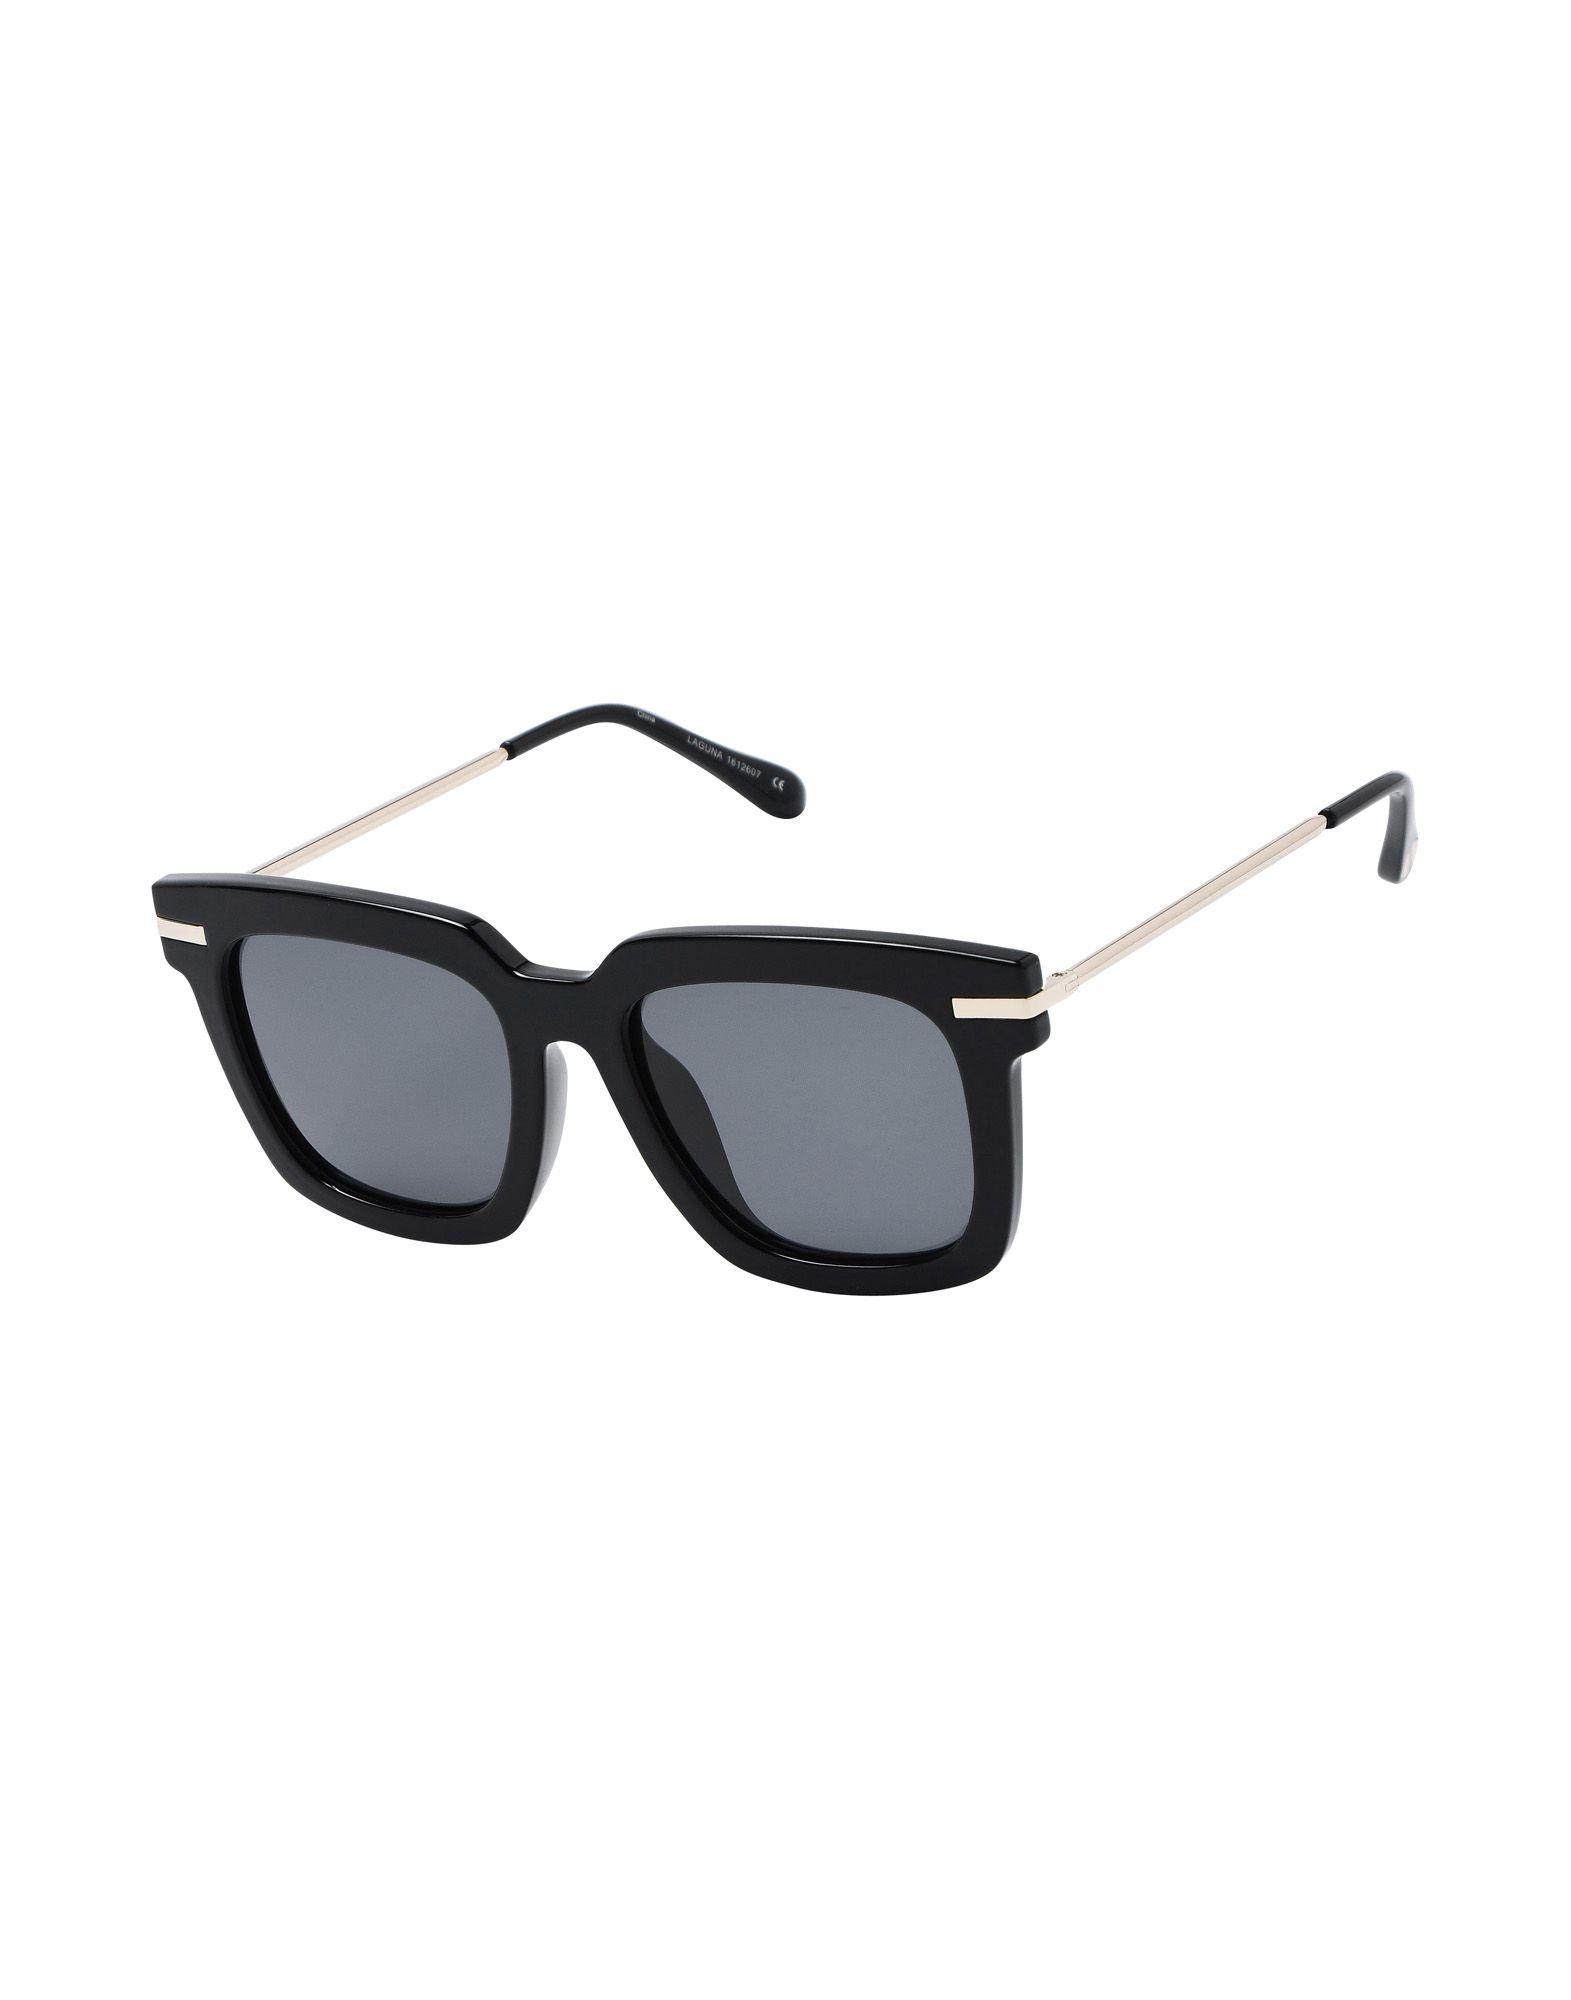 SEAFOLLY Солнечные очки web eyewear солнечные очки